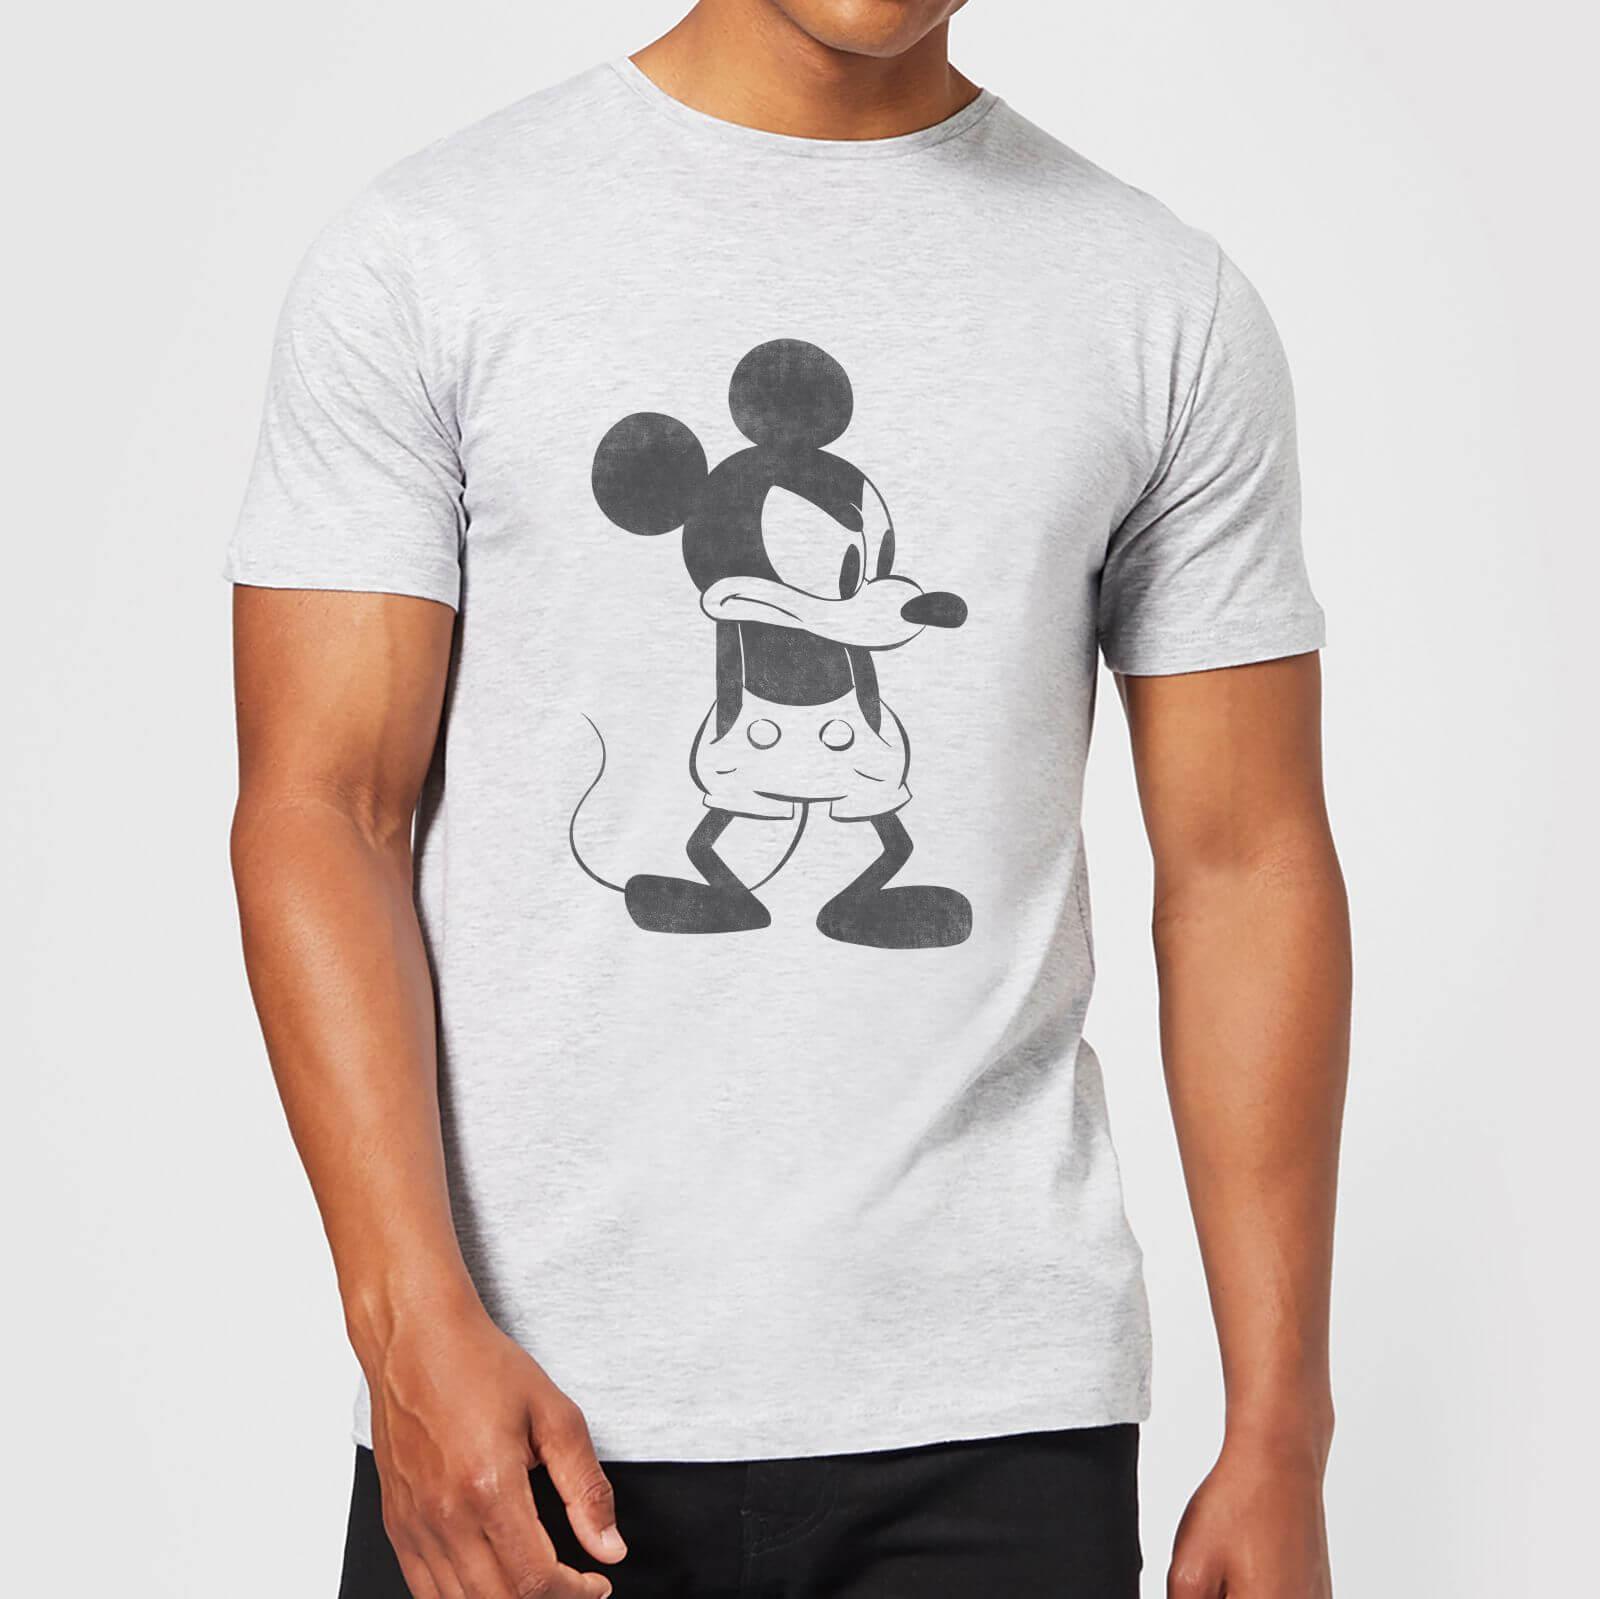 Disney Disney Mickey Mouse Angry T-Shirt - Grey - 4XL - Grey